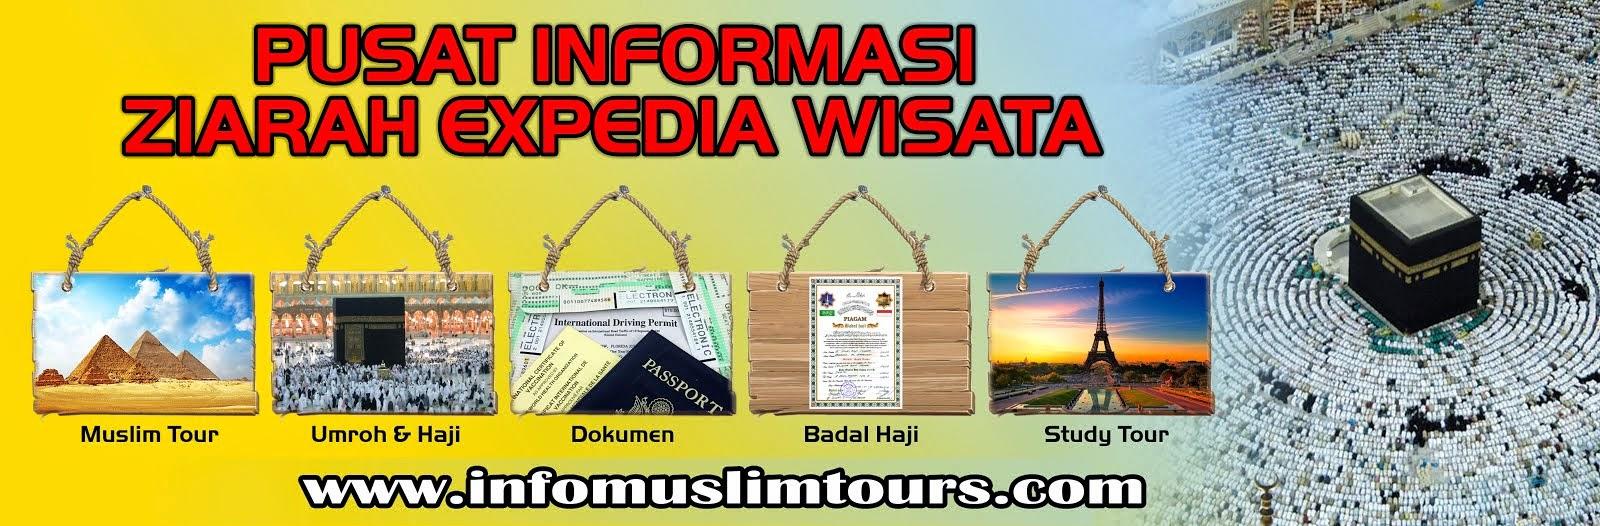 INFO MUSLIM TOURS